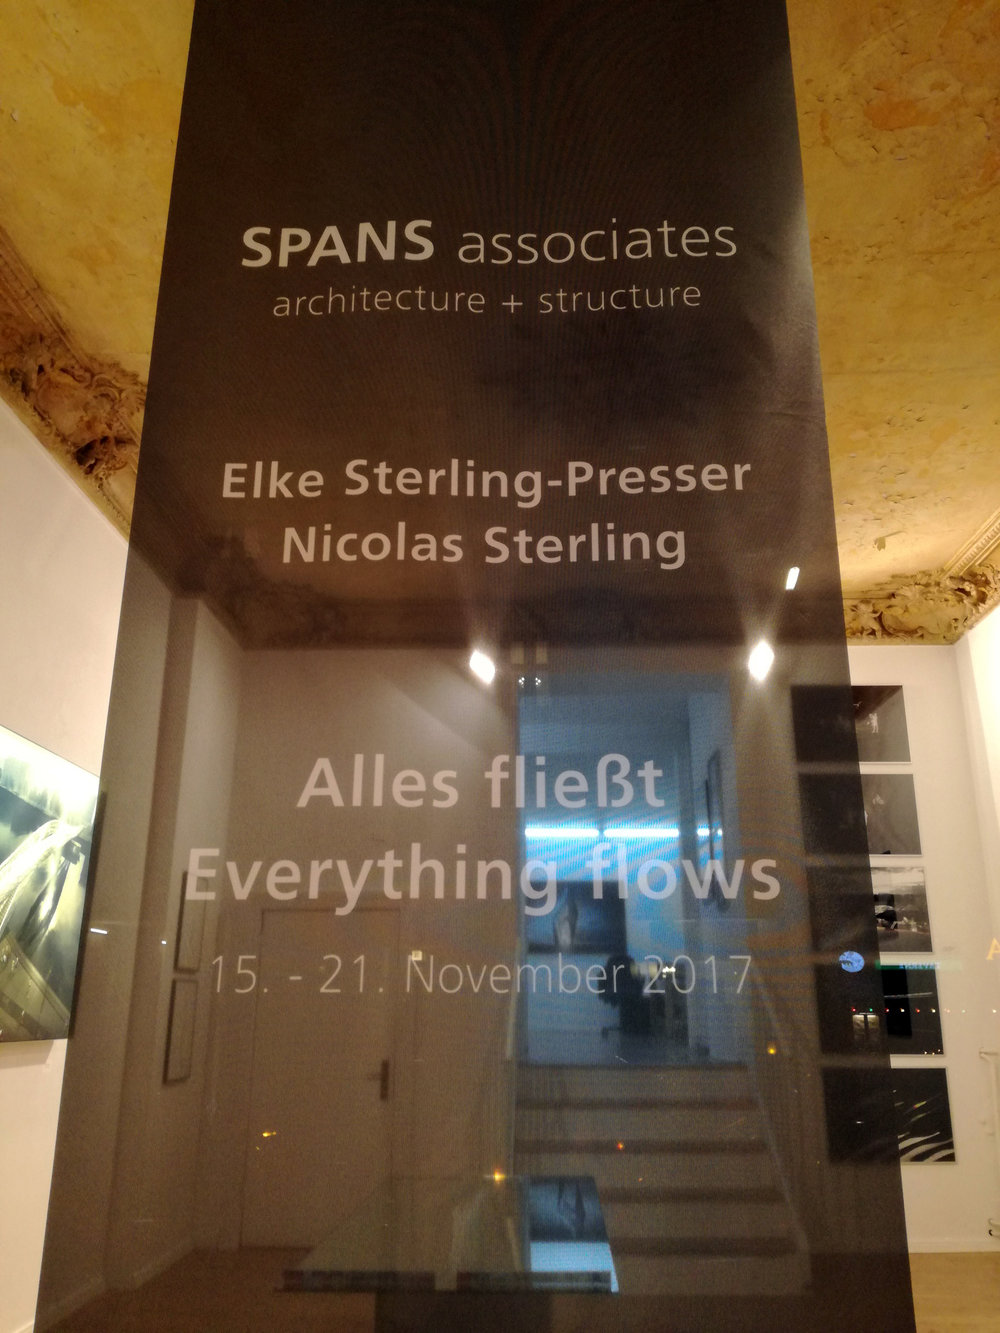 SPANS associates Vernissage Berlin Schöneberg, Nicolas Sterling, Elke Sterling Presser, ns_spans, nicolassterling, elkesterlingpresser, spans